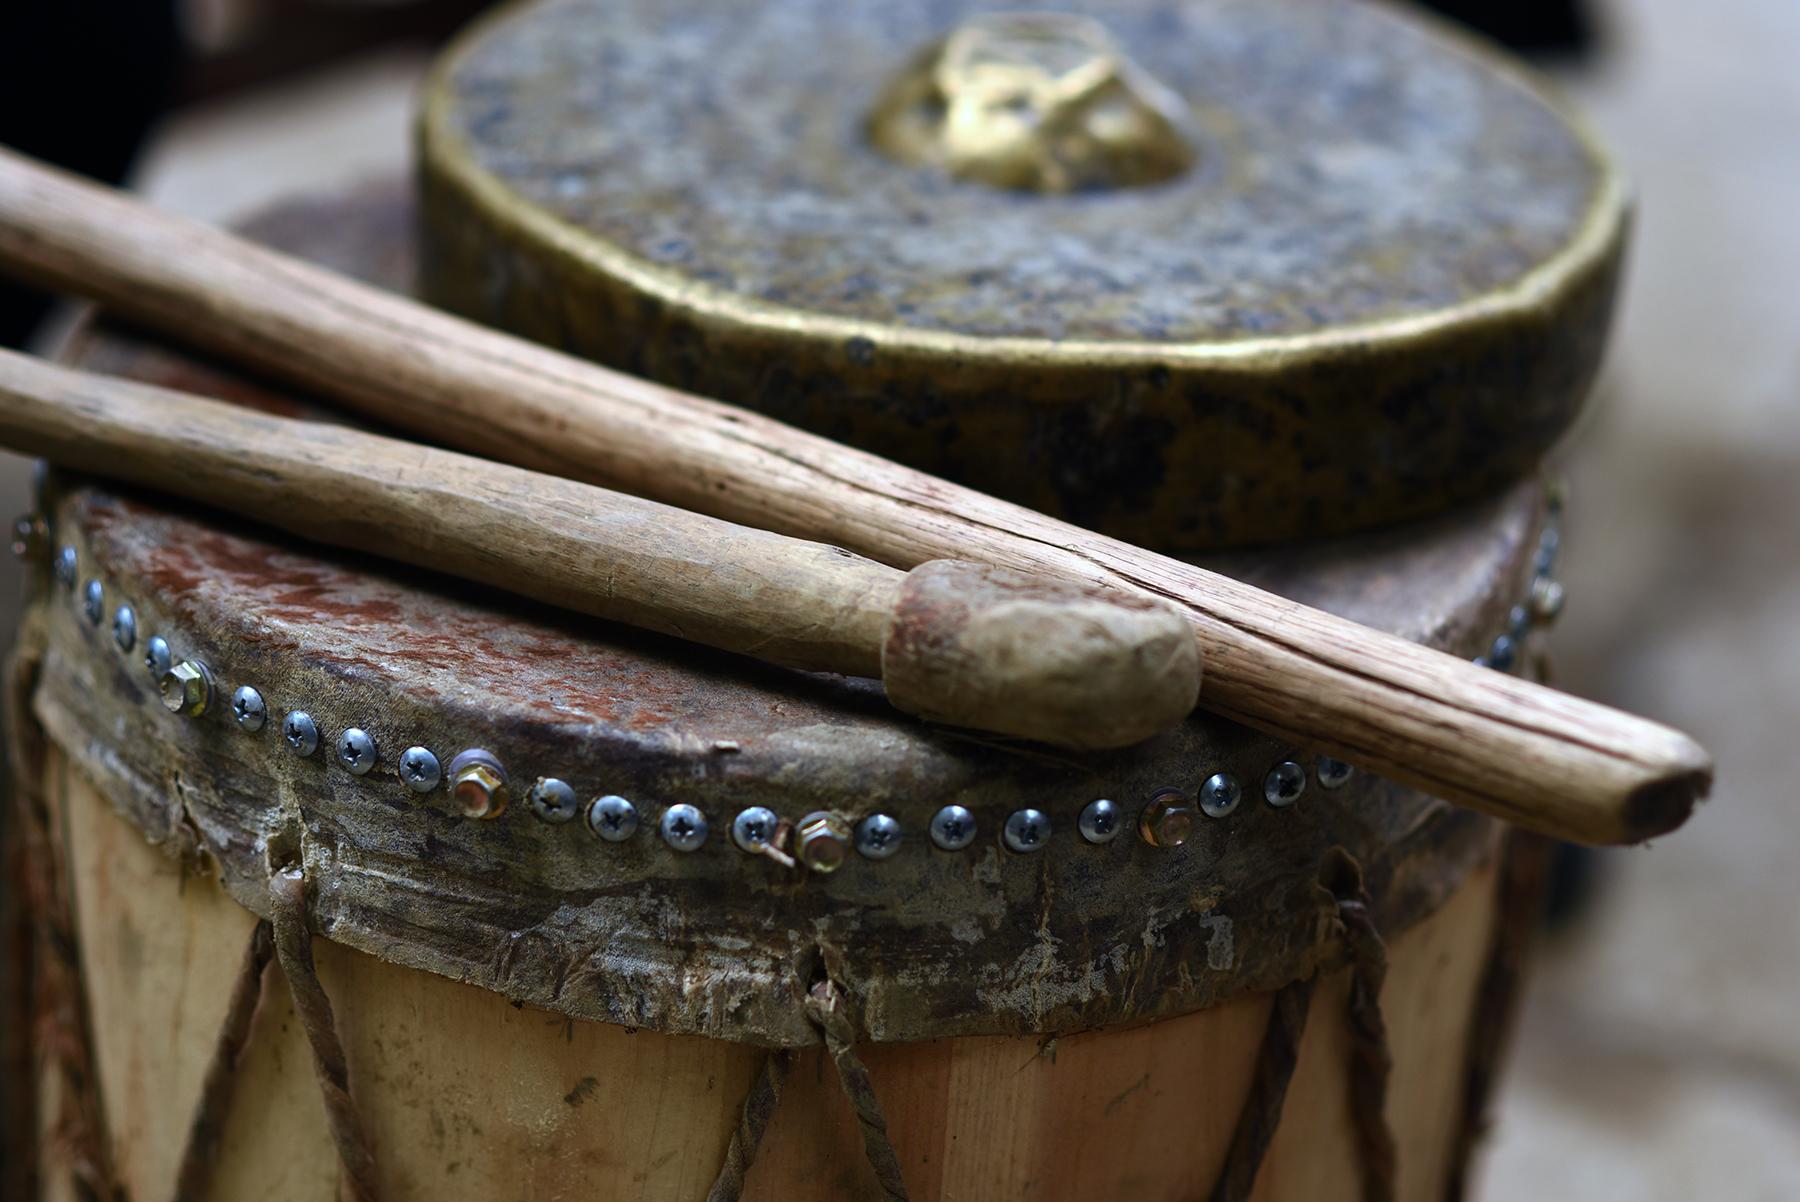 Mang Drum Dance instruments.